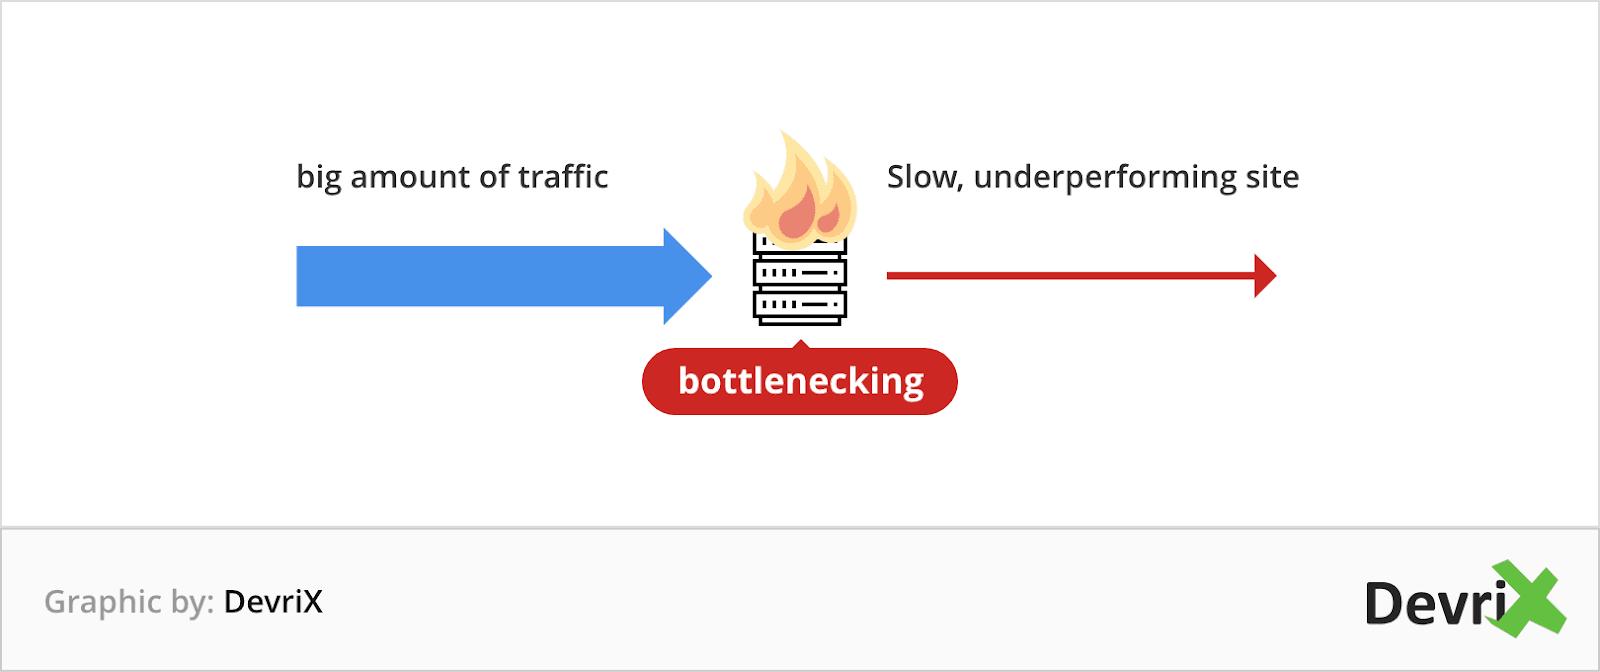 bottlenecking traffic illustration